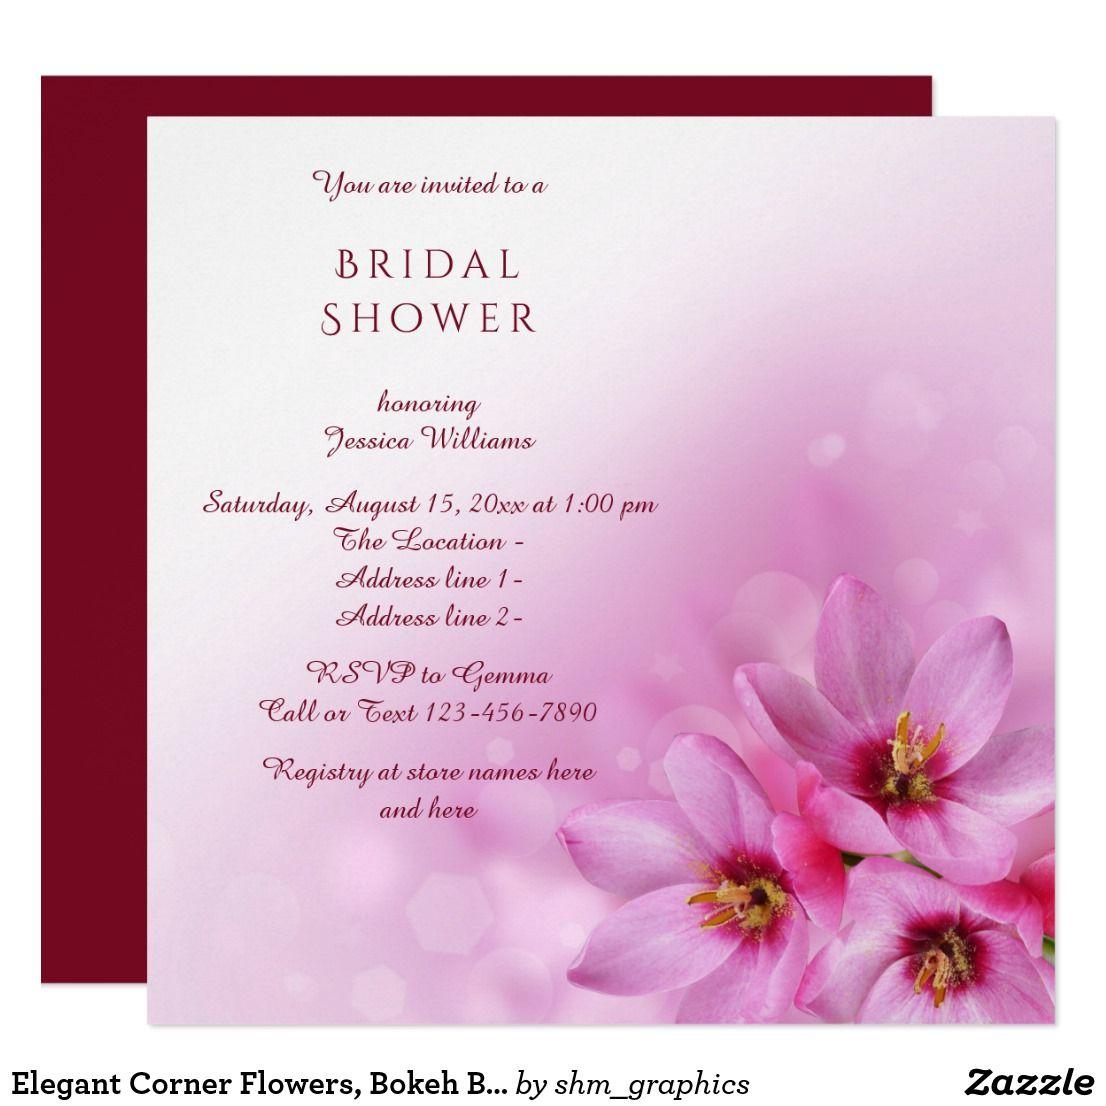 Bokeh Flowers Wedding: Elegant Corner Flowers, Bokeh Bridal Shower Party